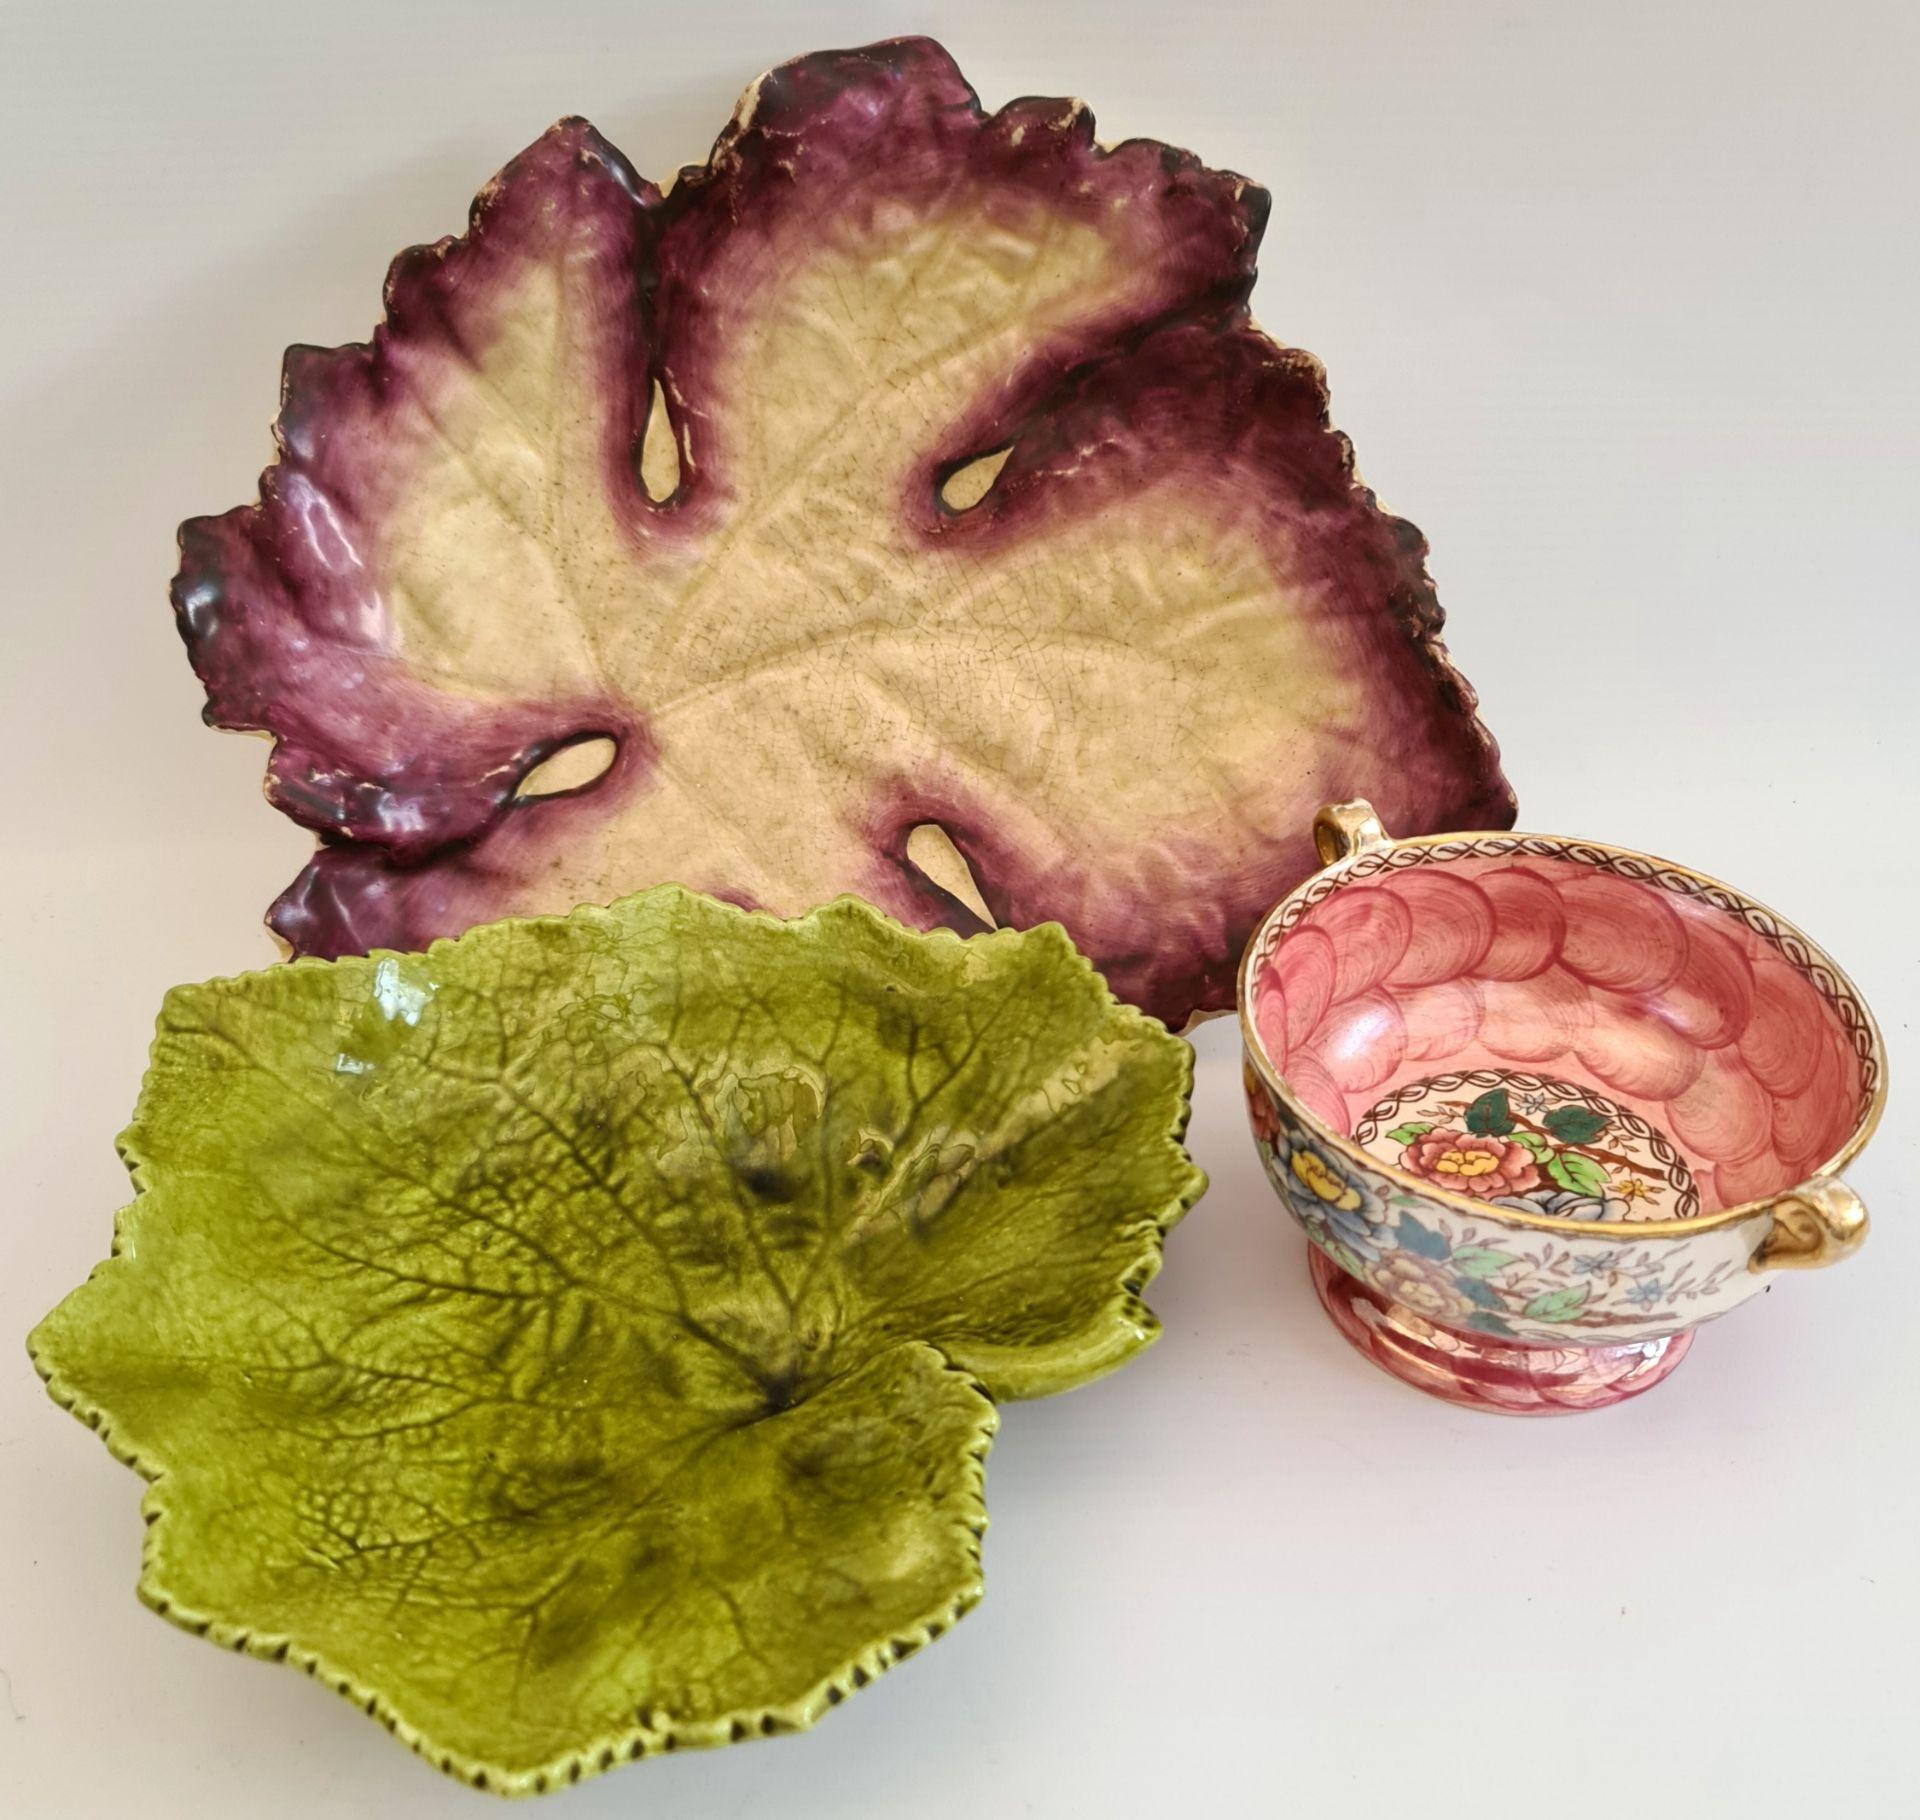 Antique Bretby Vine leaf Pottery Mailing & Minton - Image 2 of 5